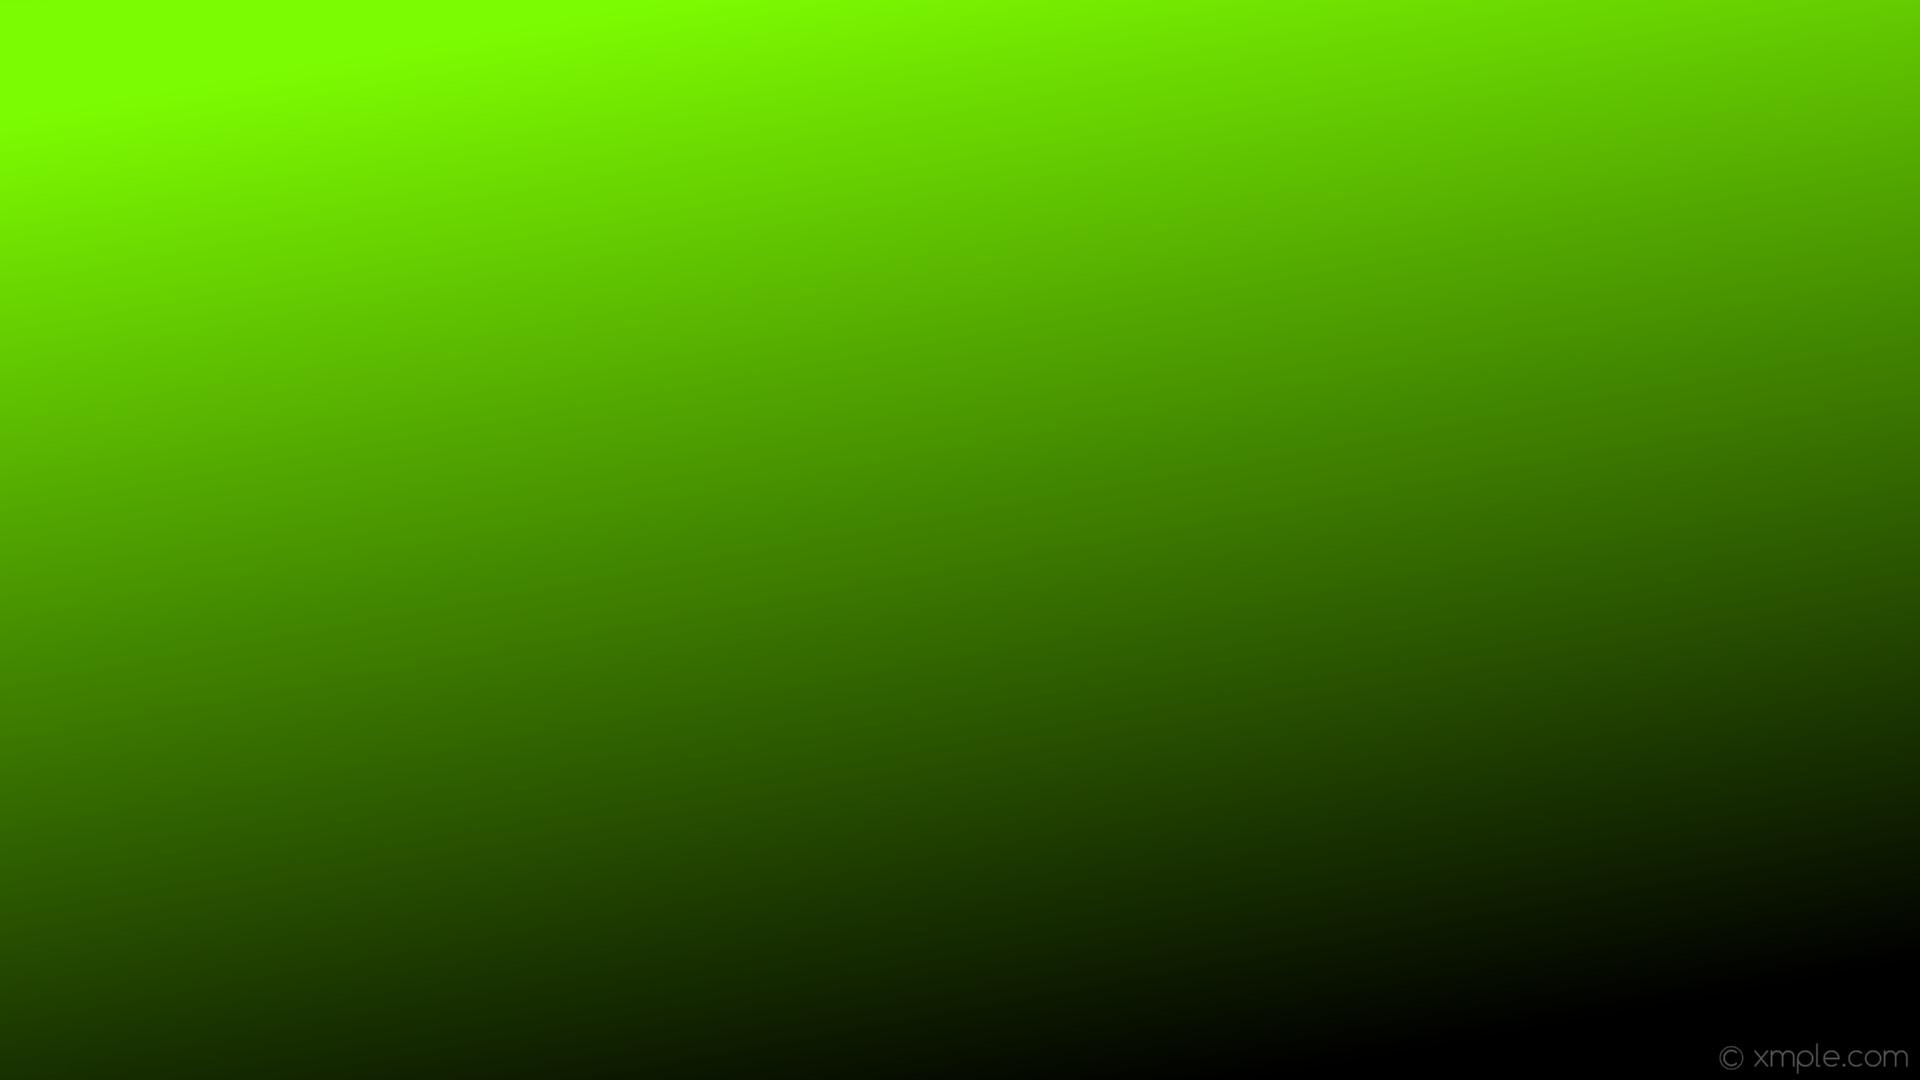 wallpaper green linear black gradient lawn green #7cfc00 #000000 120°